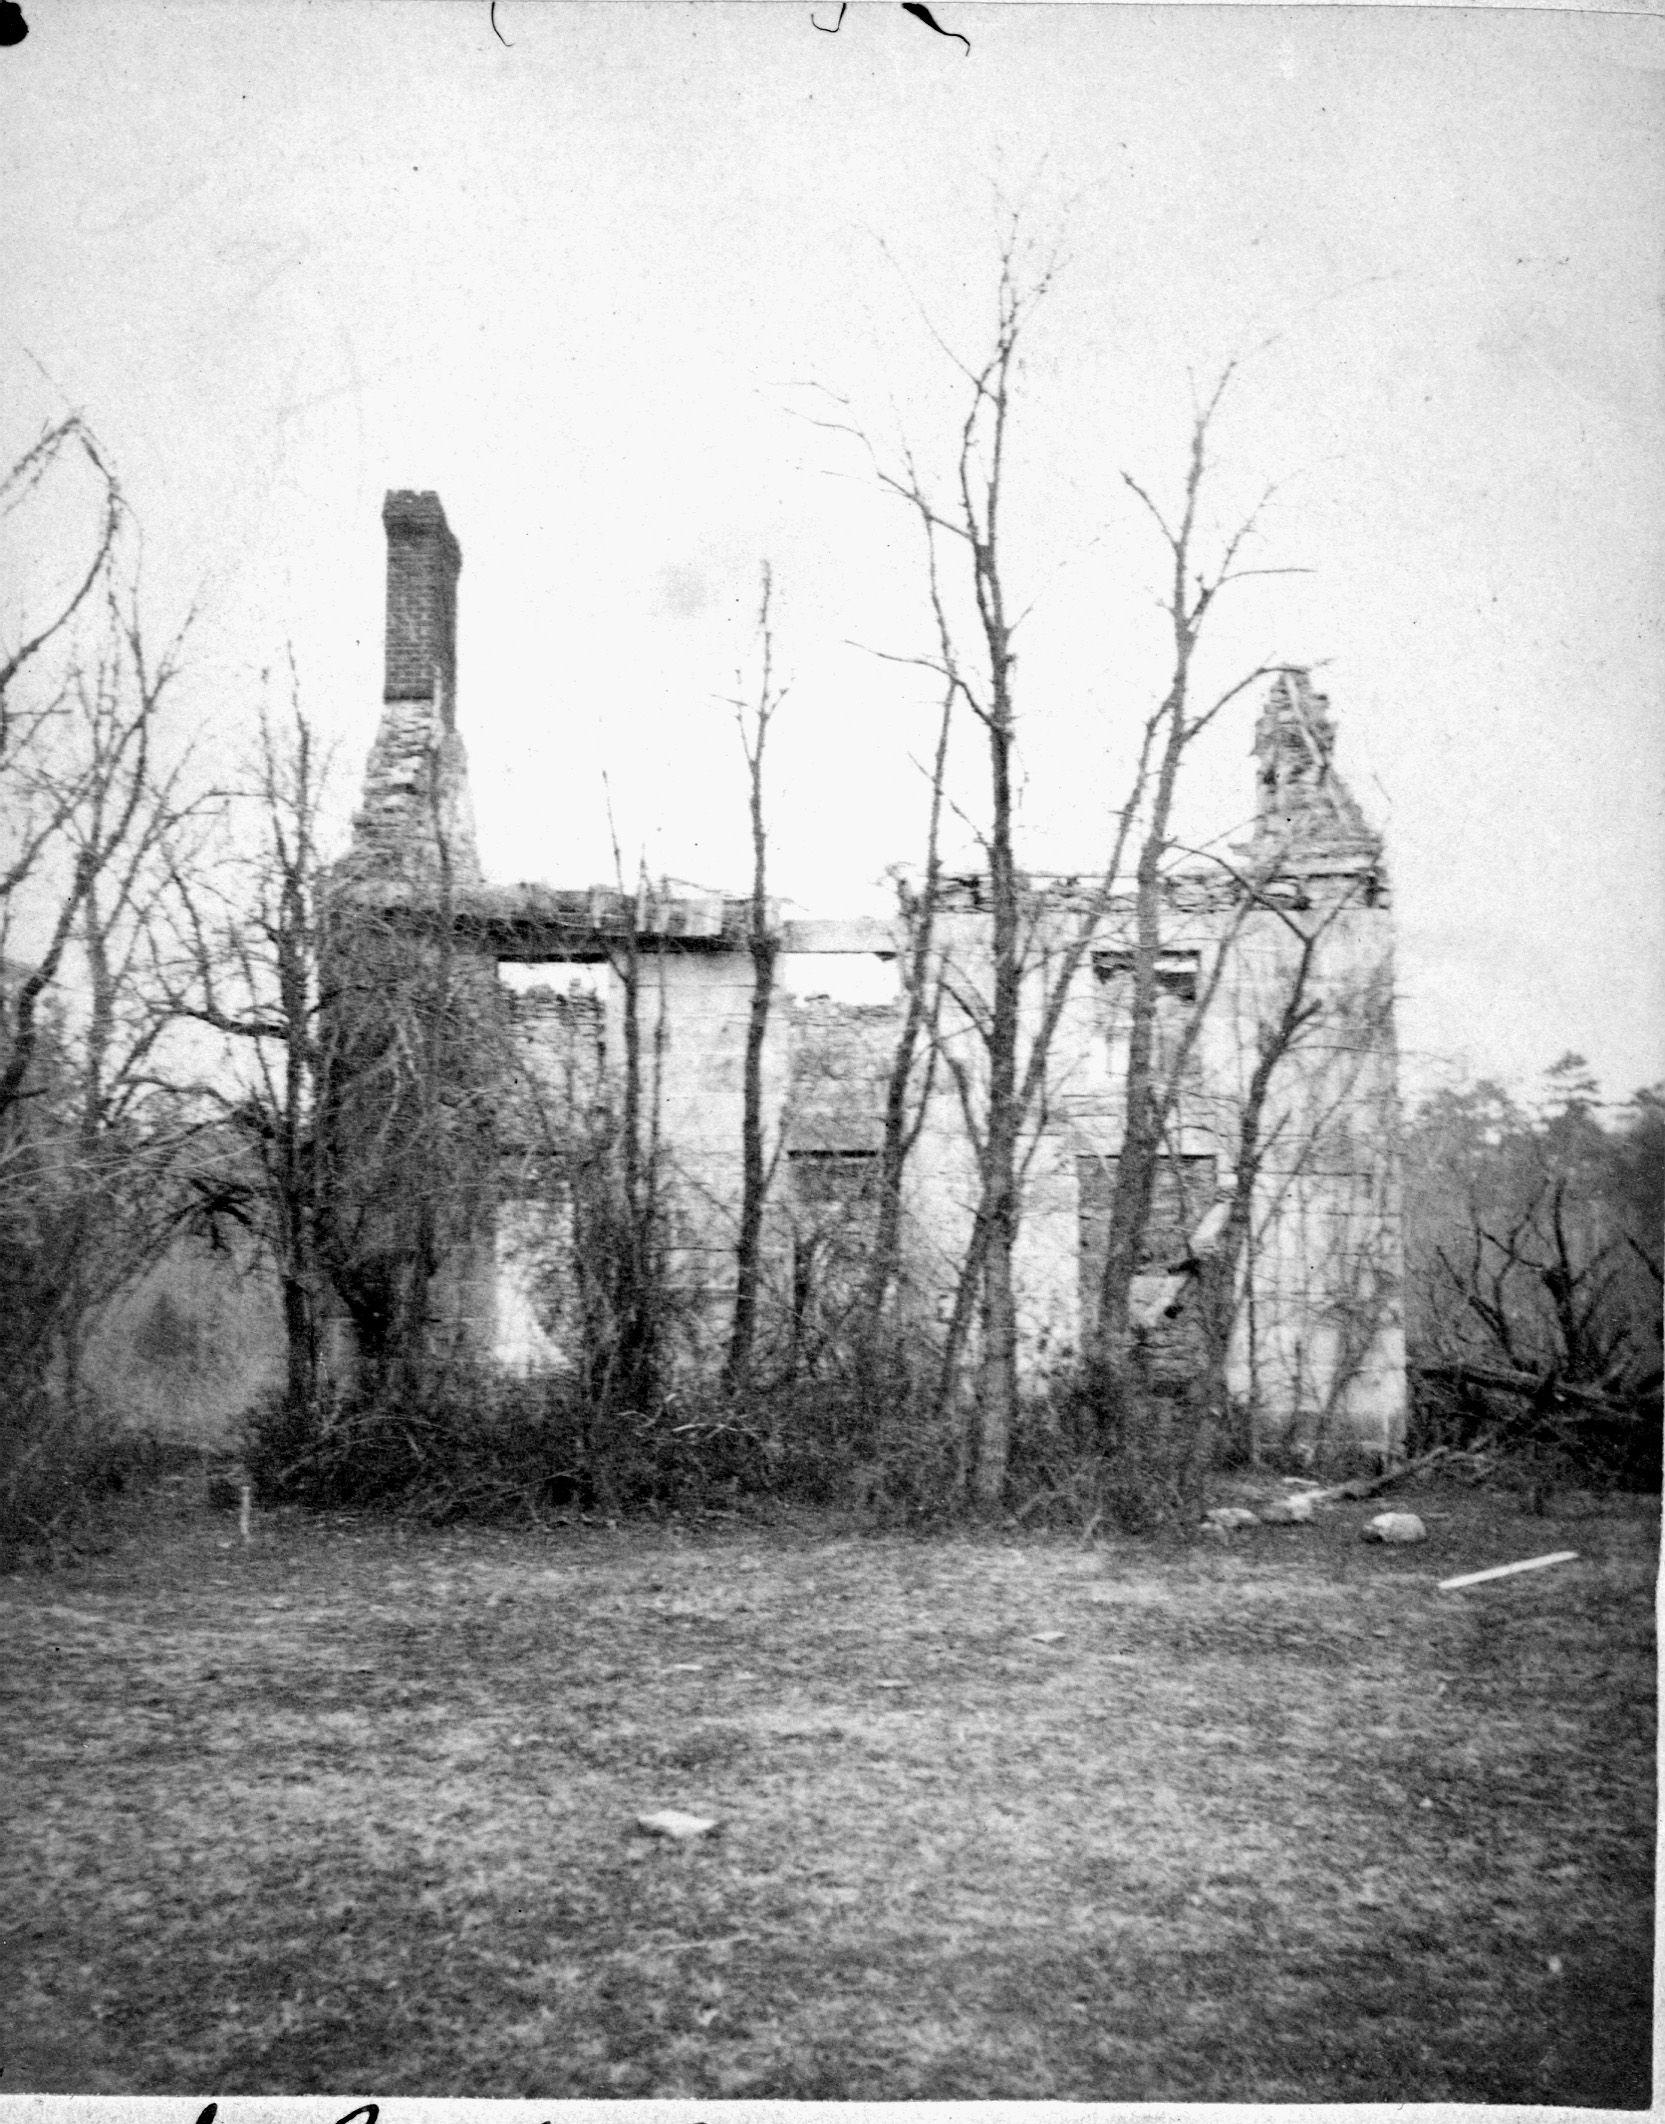 (1860s) Ruined building - Fredericksburg, VA